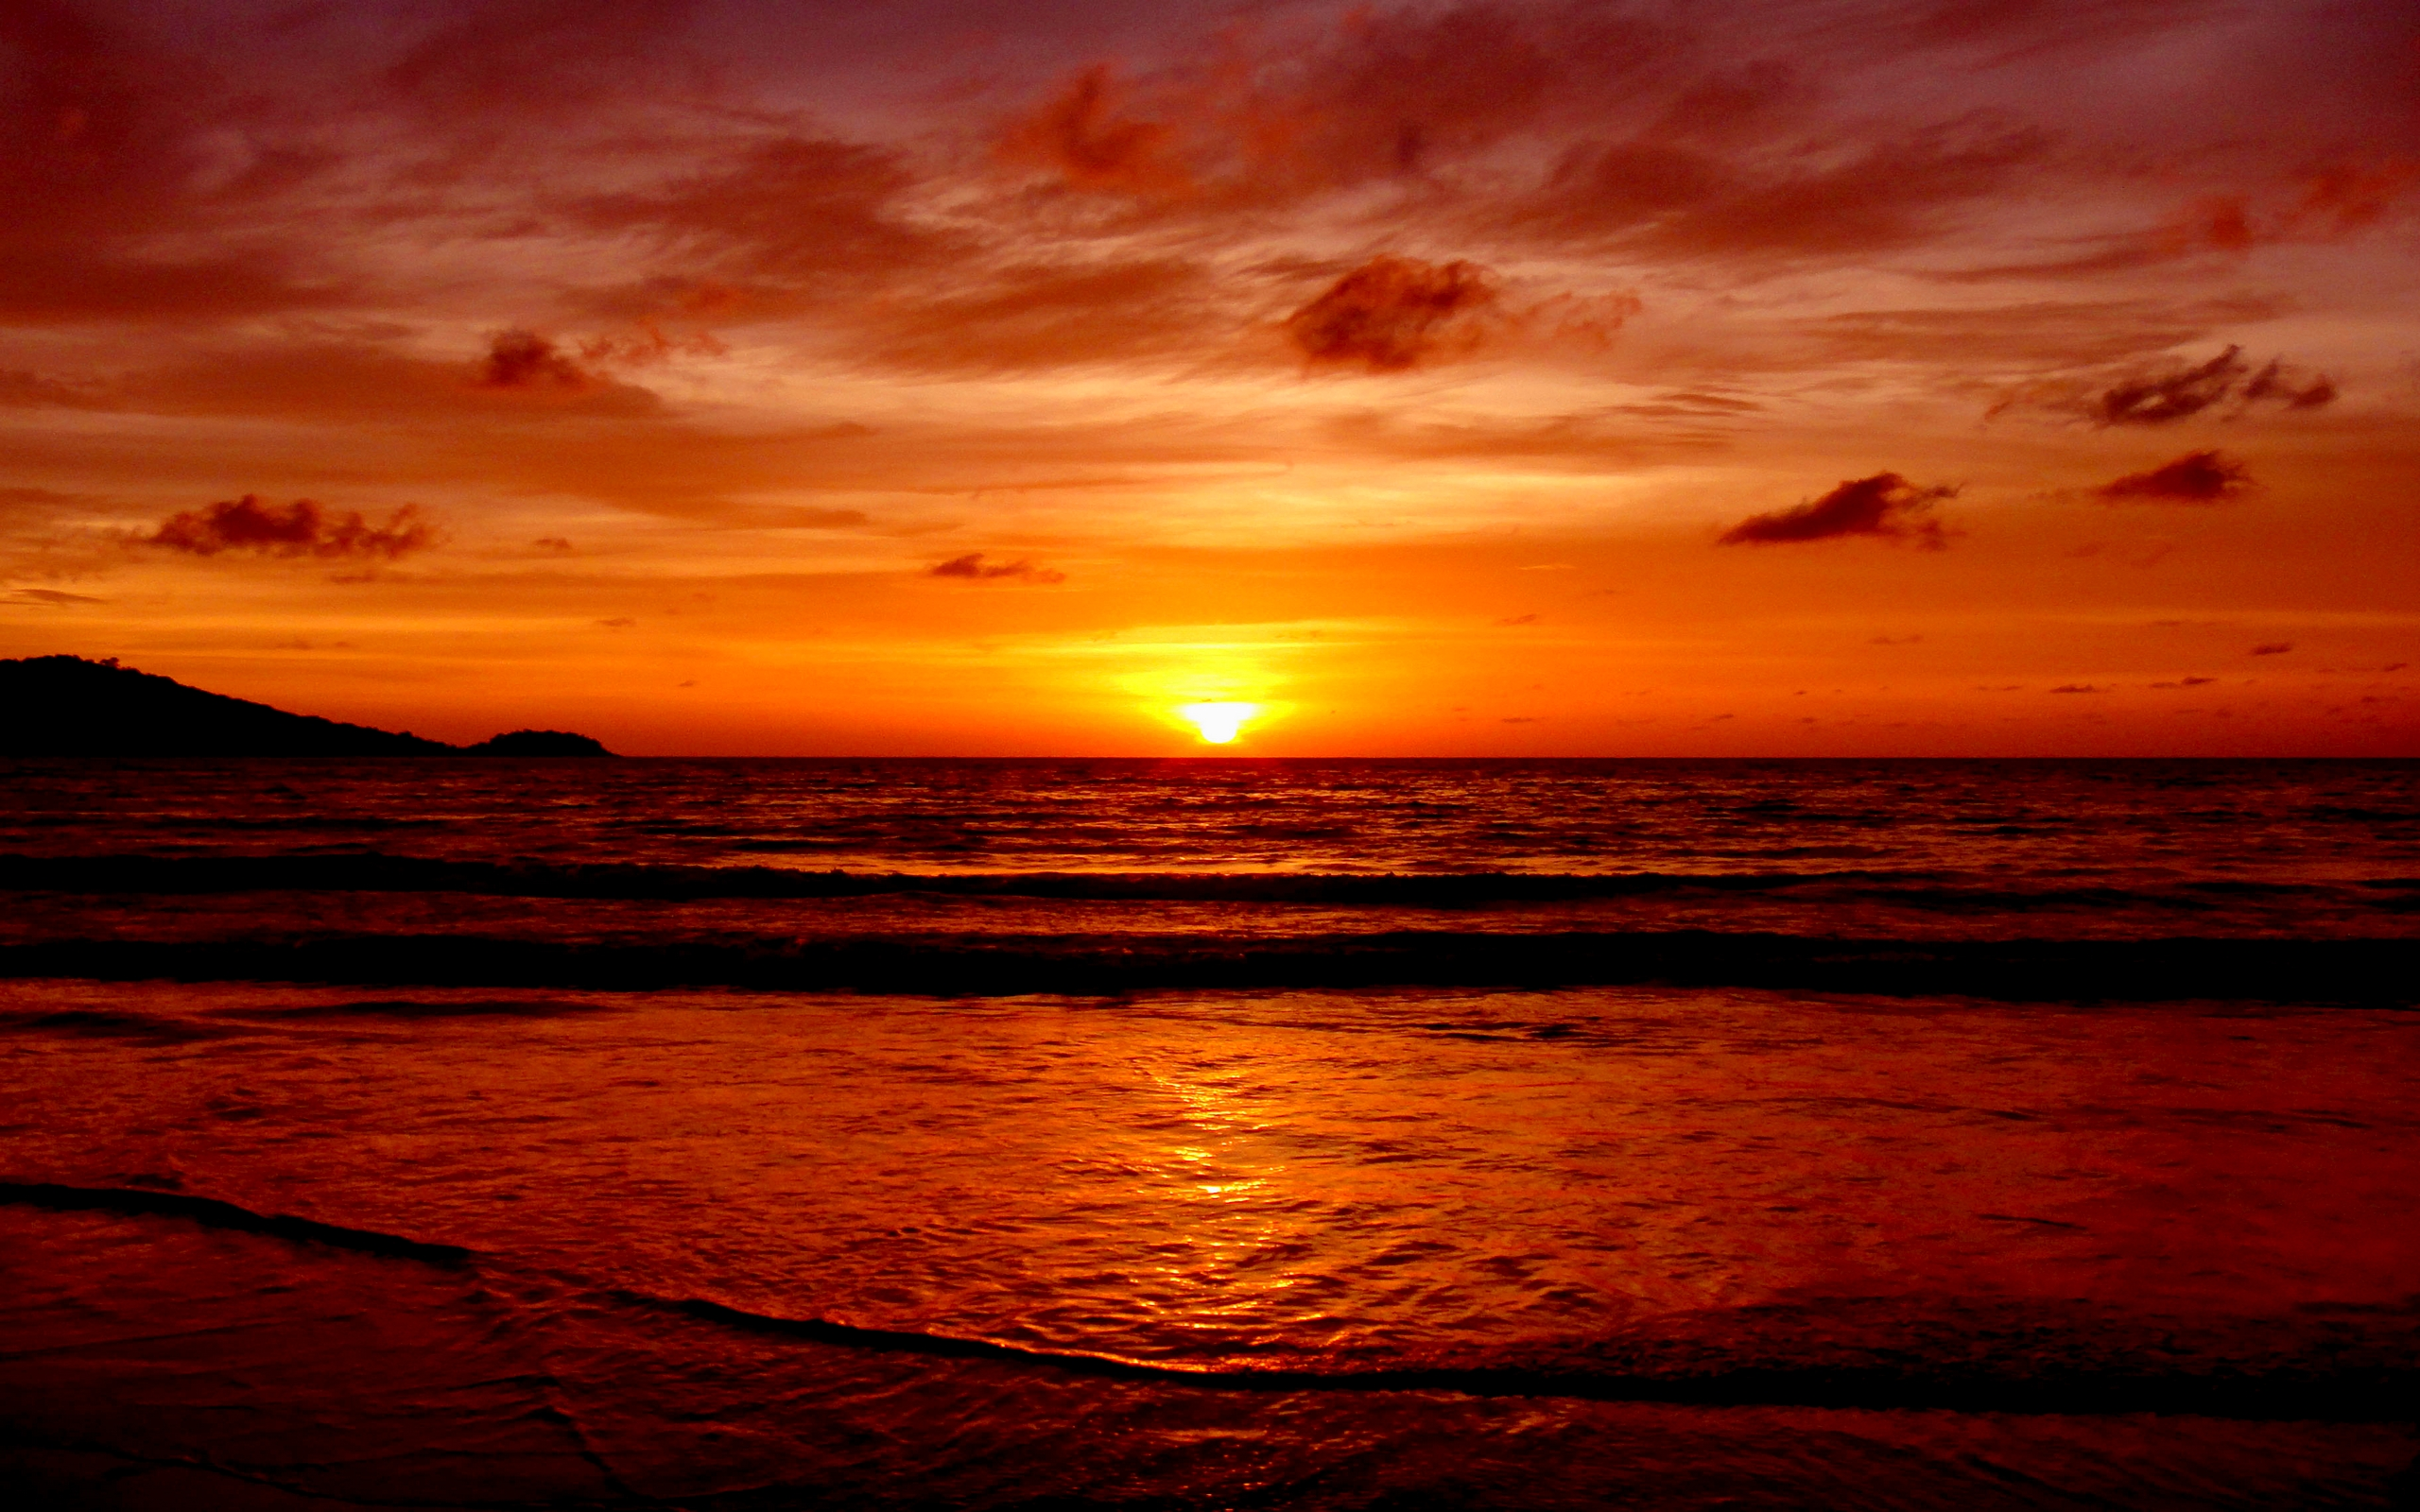 best sunset on horizon image